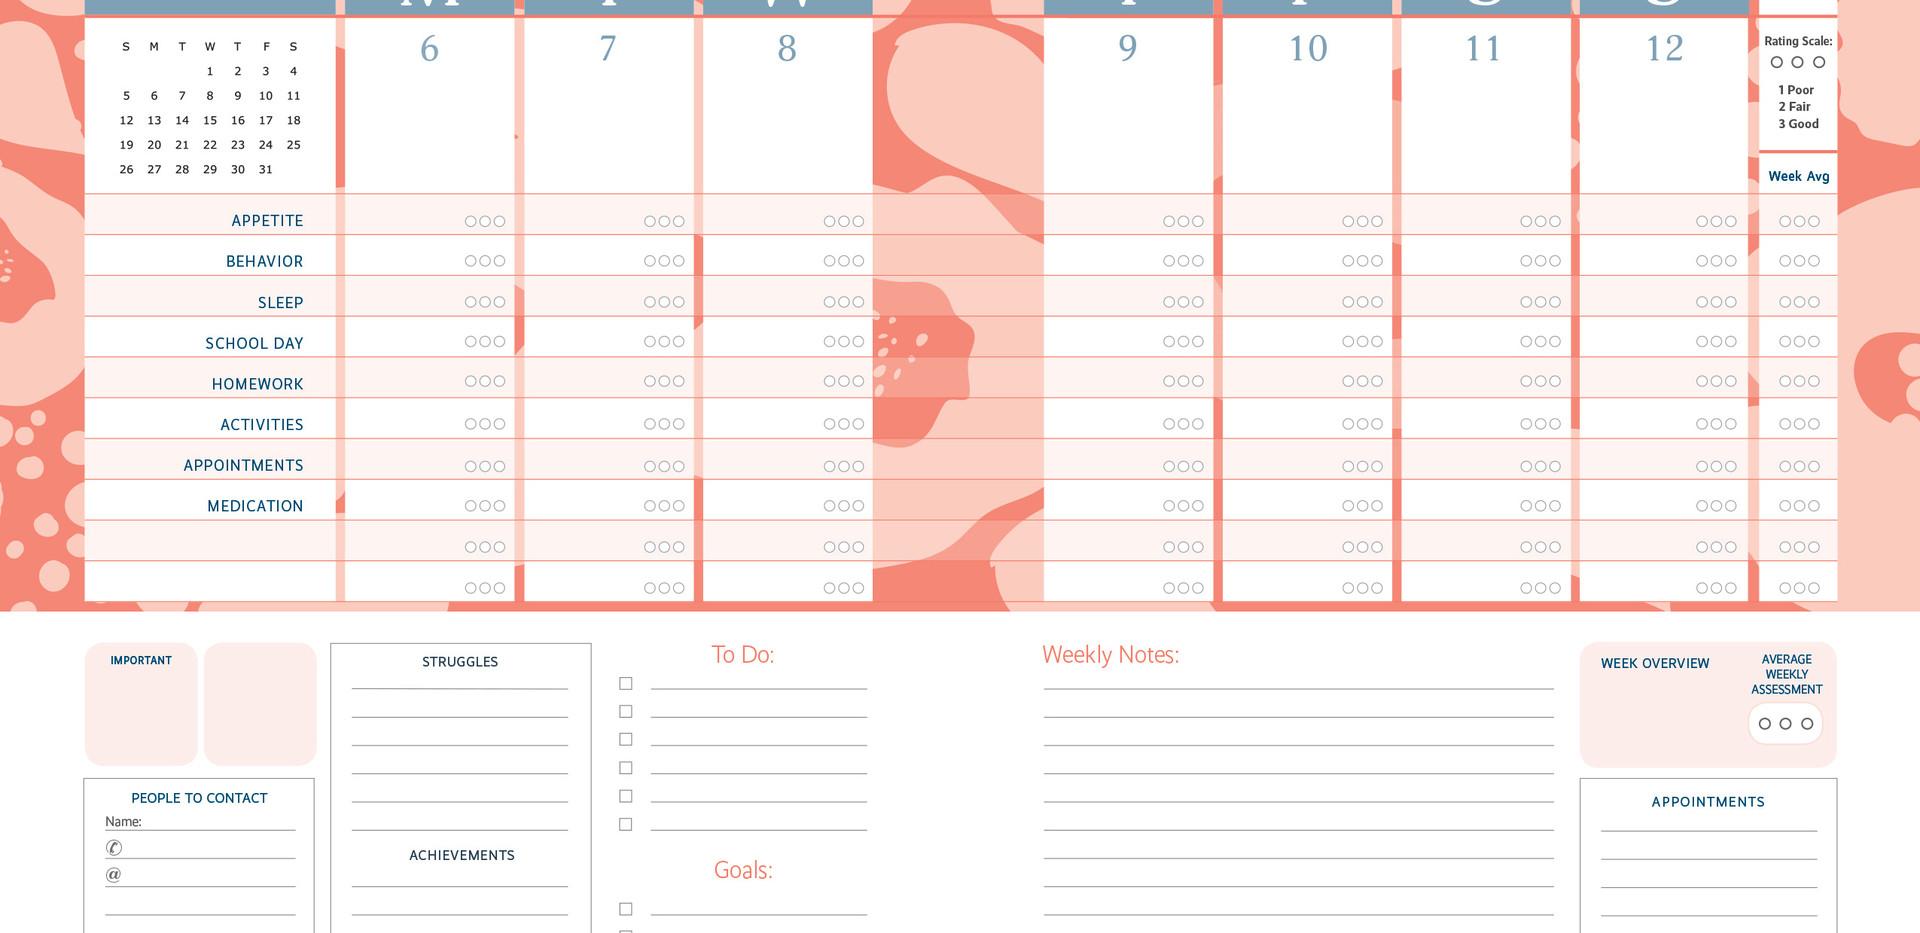 Weekly Planner Symptom Tracker